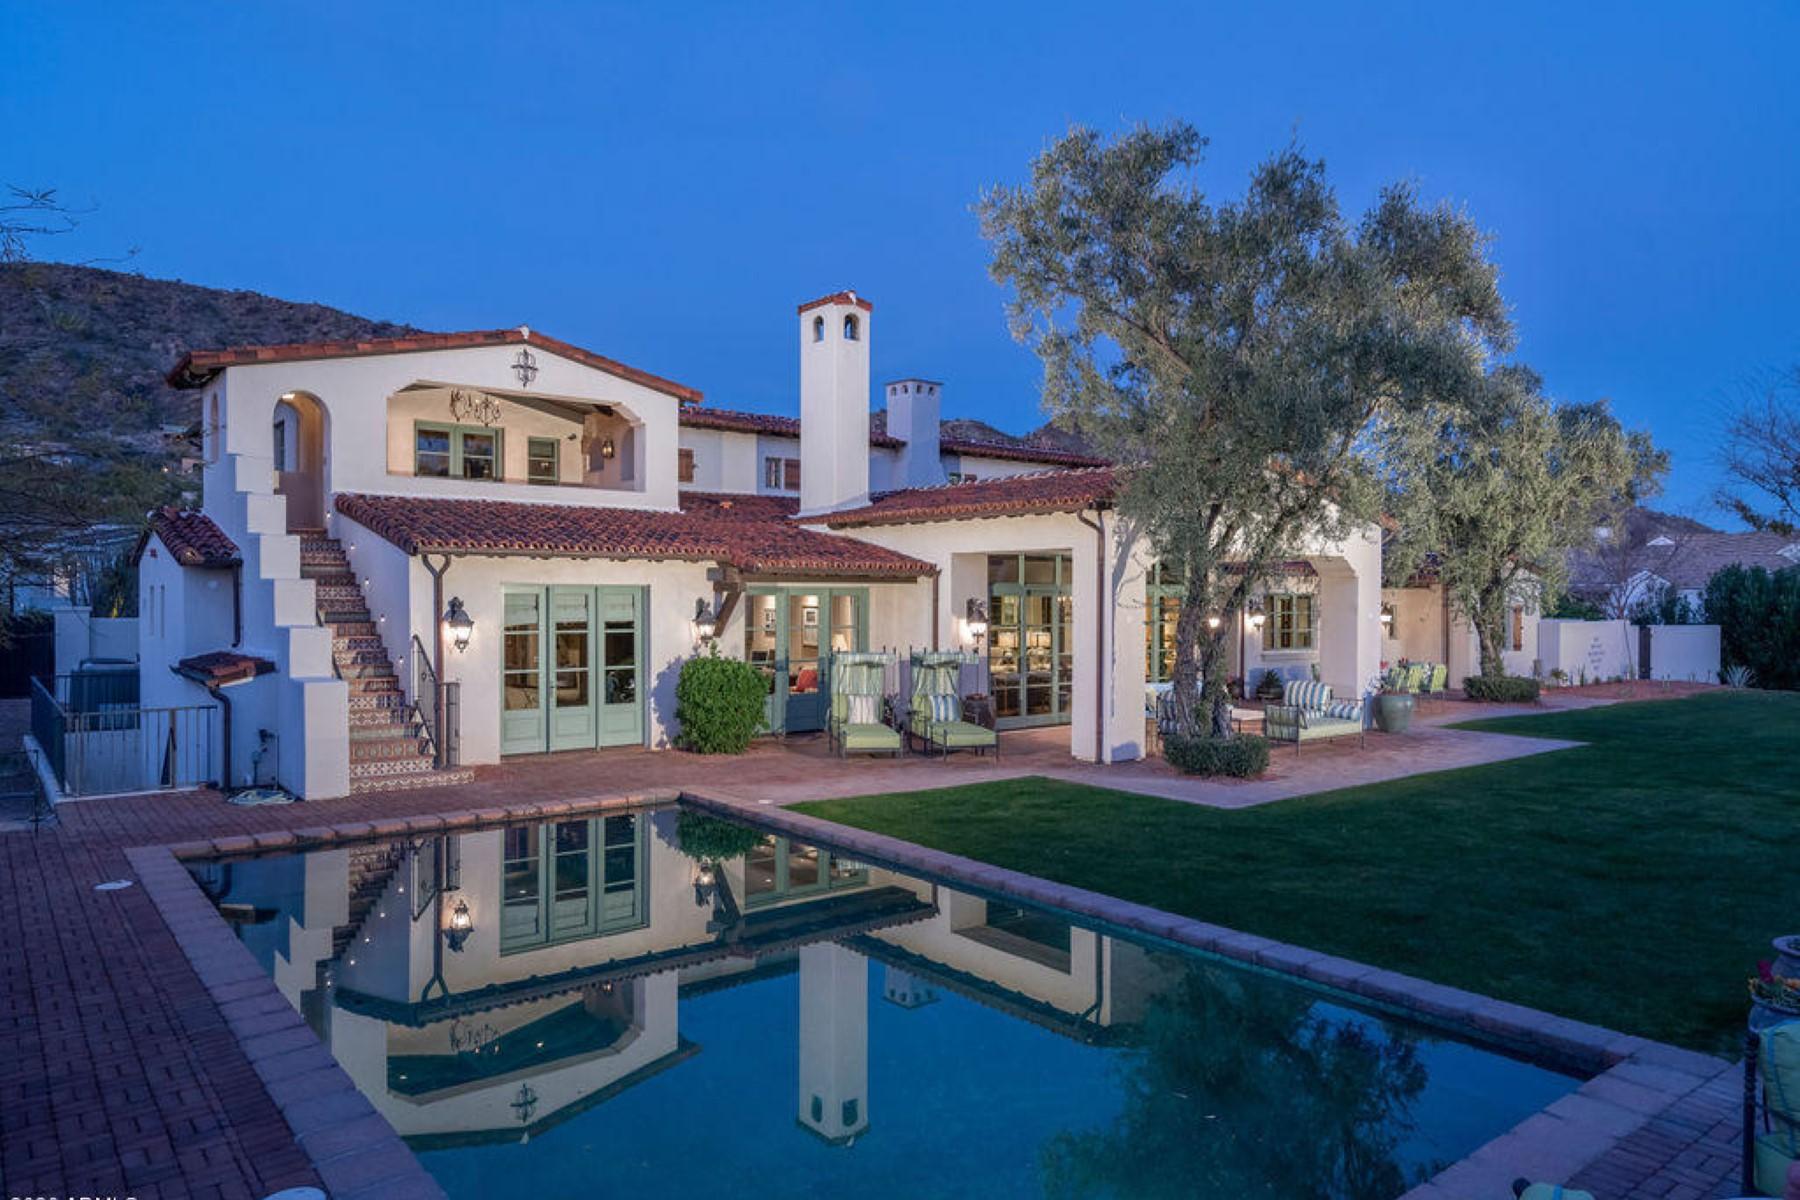 Single Family Homes for Sale at Club Estates 5729 E Cactus Wren RD Paradise Valley, Arizona 85253 United States